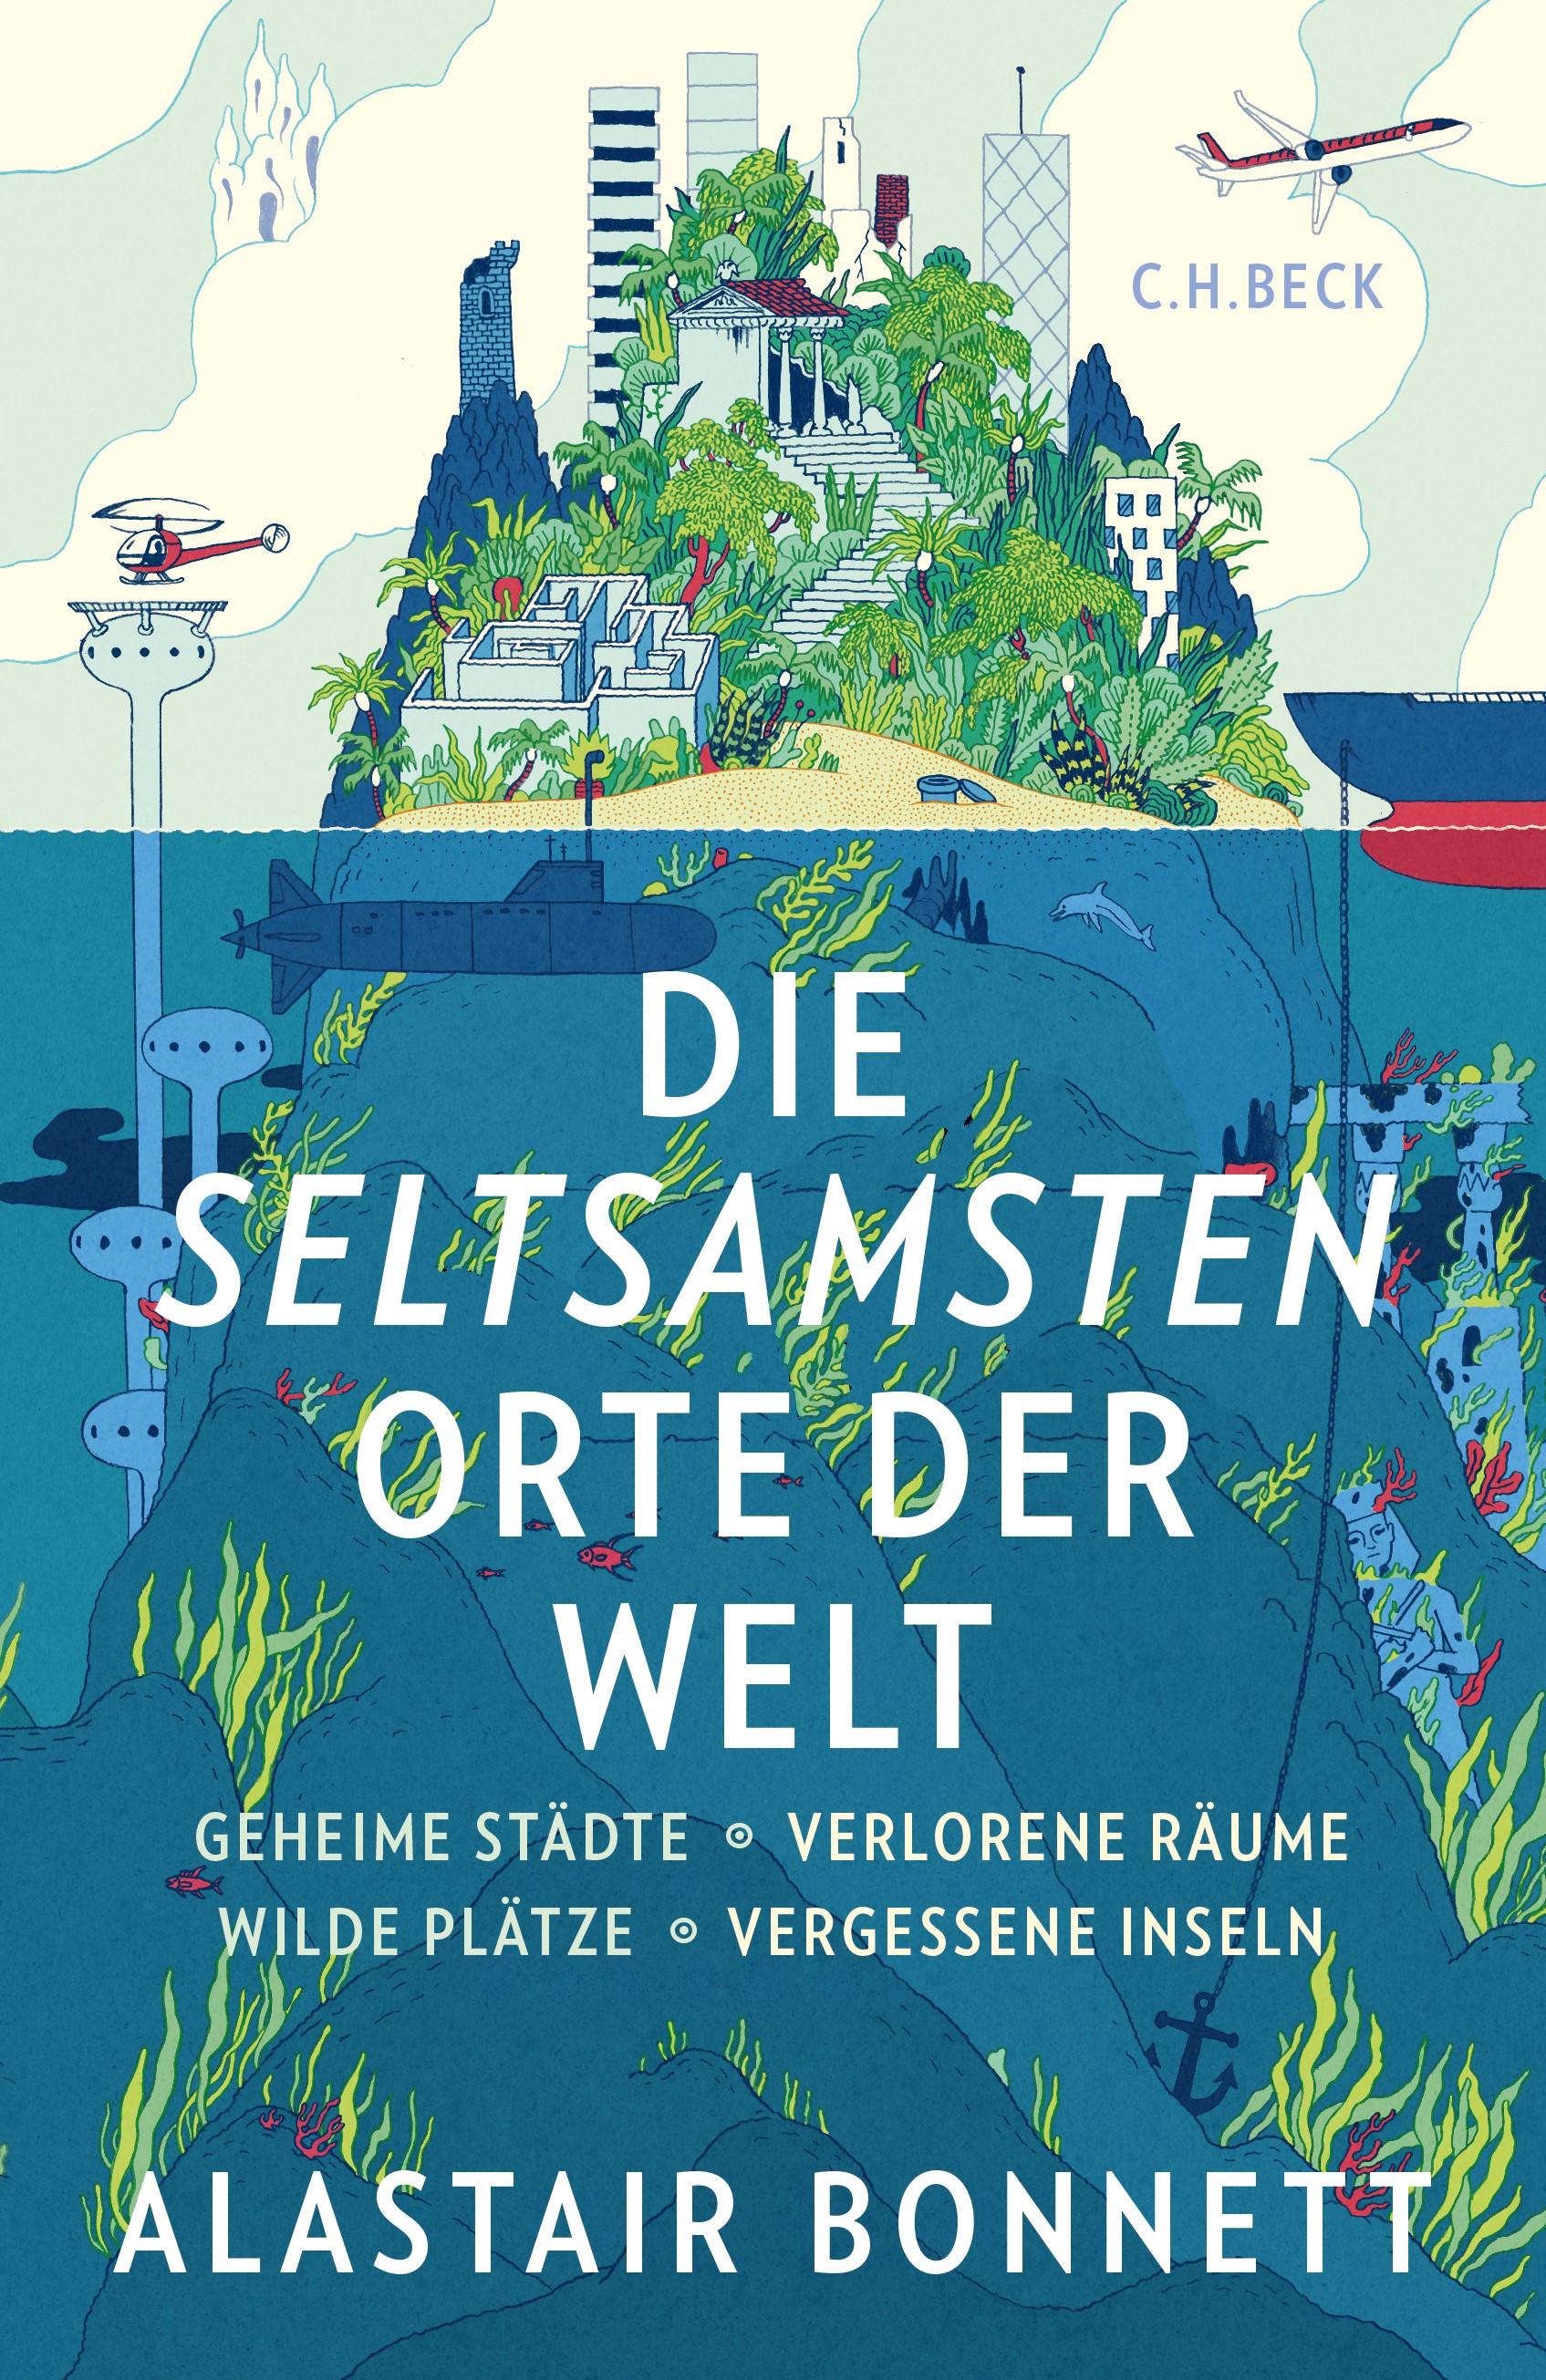 Die seltsamsten Orte der Welt | Bonnett, Alastair | 8. Auflage, 2015 | Buch (Cover)